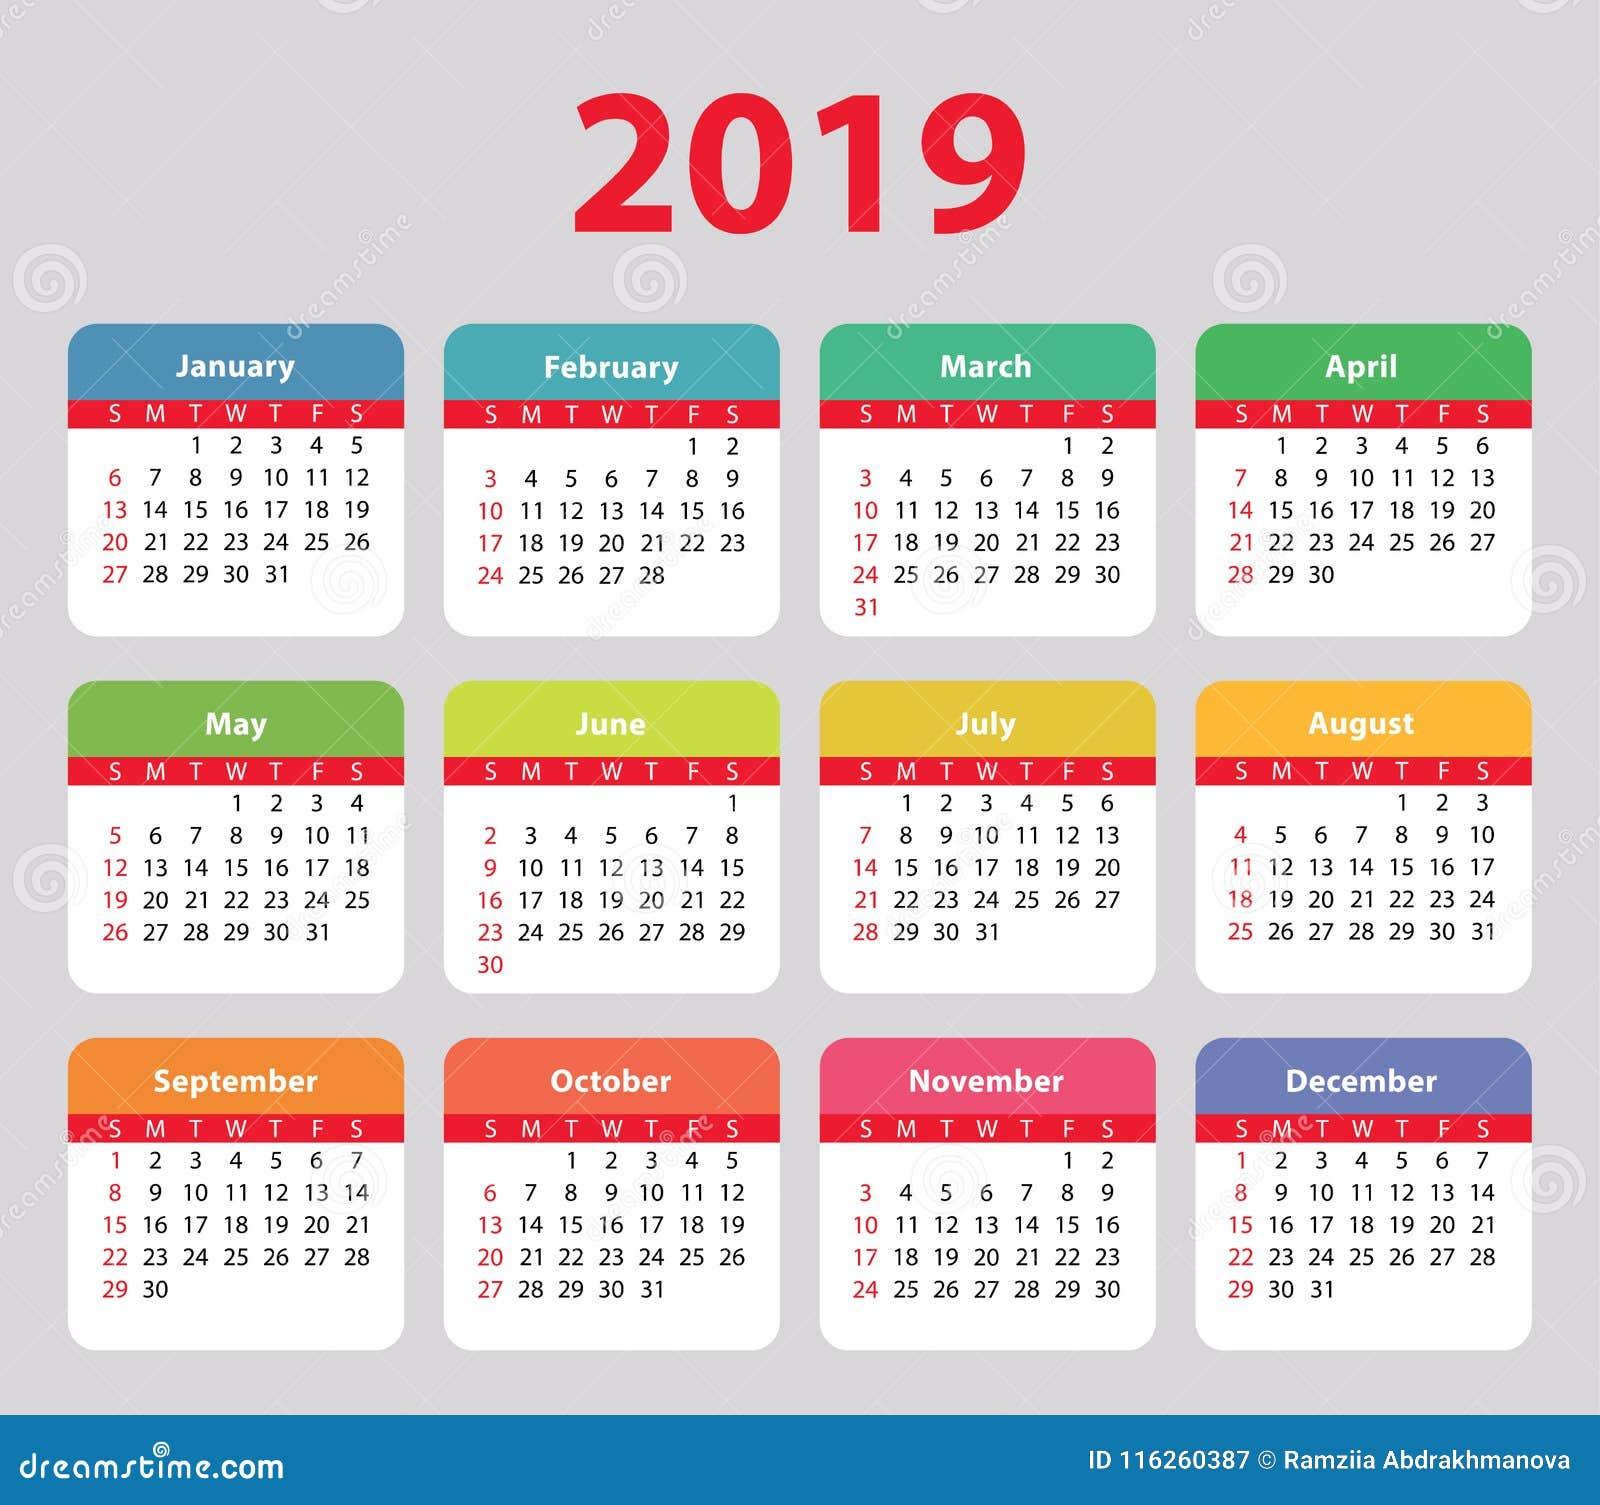 Calendario 2019 Week Number.Calendar 2019 Week Starts On Sunday Basic Colorful Stock